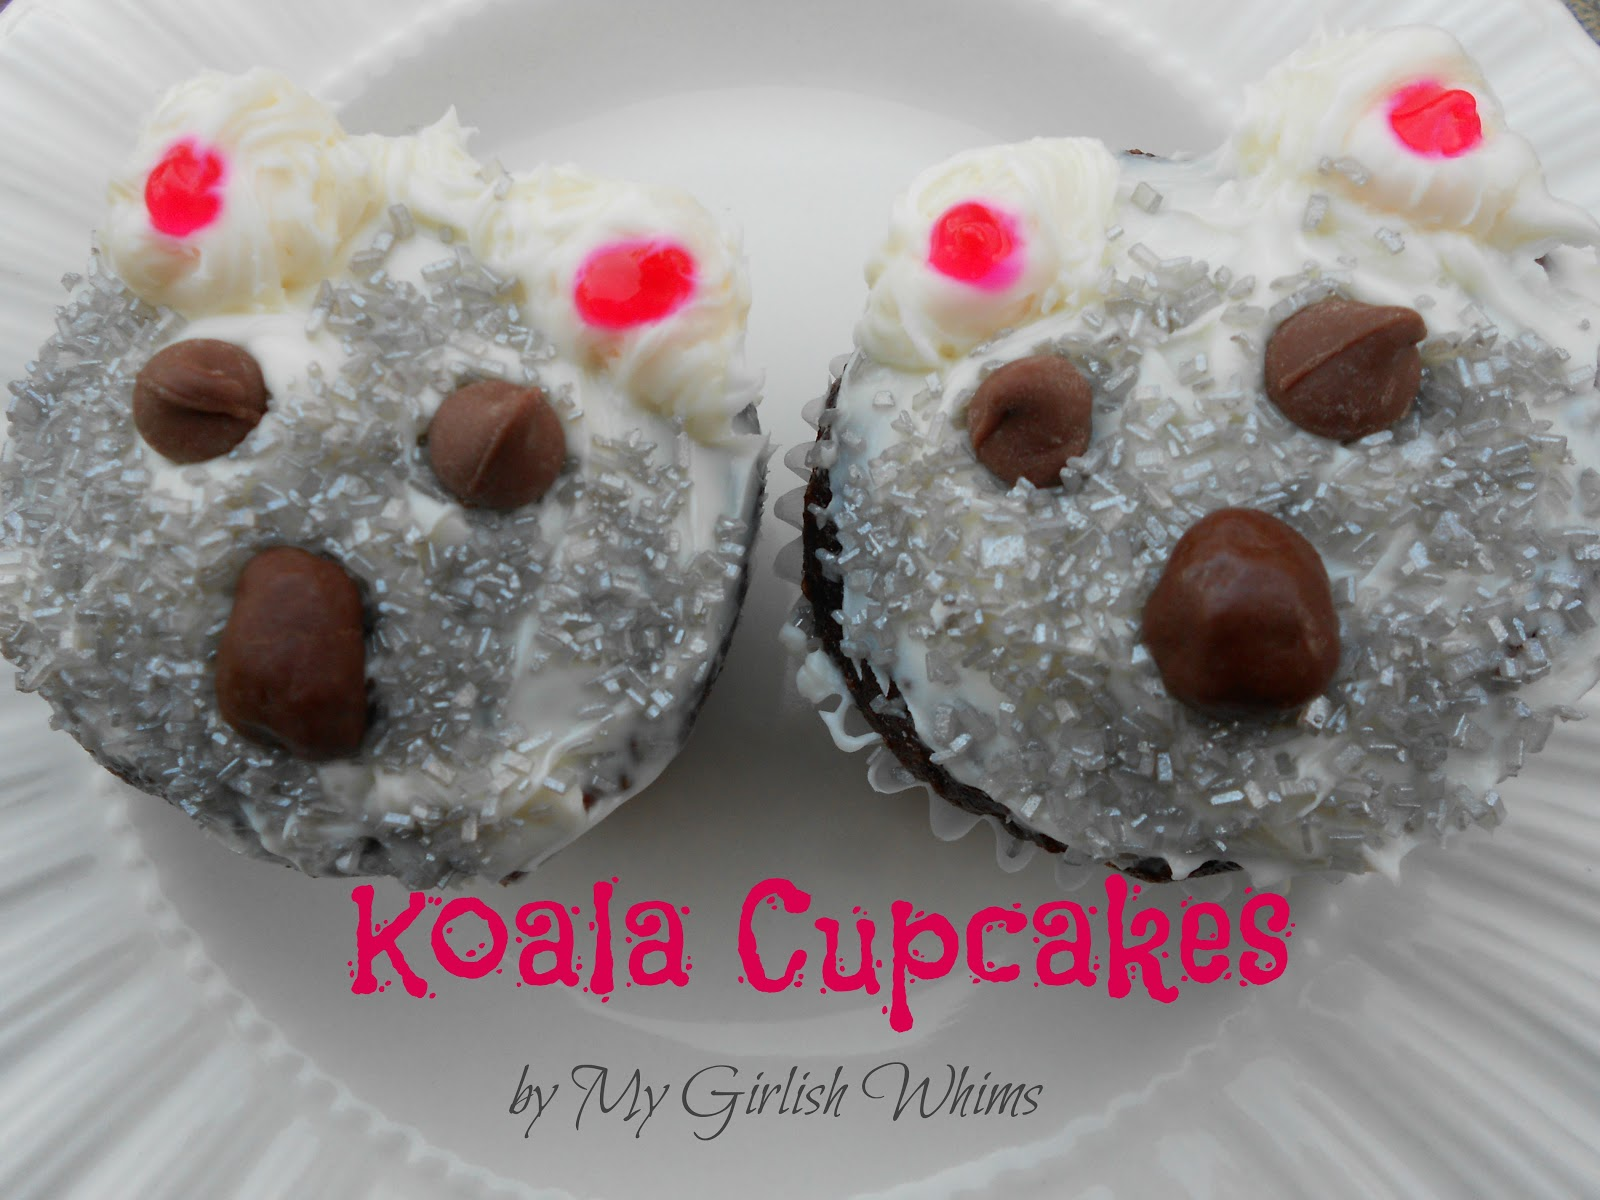 http://2.bp.blogspot.com/-k0gCA8VwD2k/UIAV1KOcVkI/AAAAAAAAFI8/LlgfzzBh3mw/s1600/Koala%2BCupcakes%2BDIY.jpg